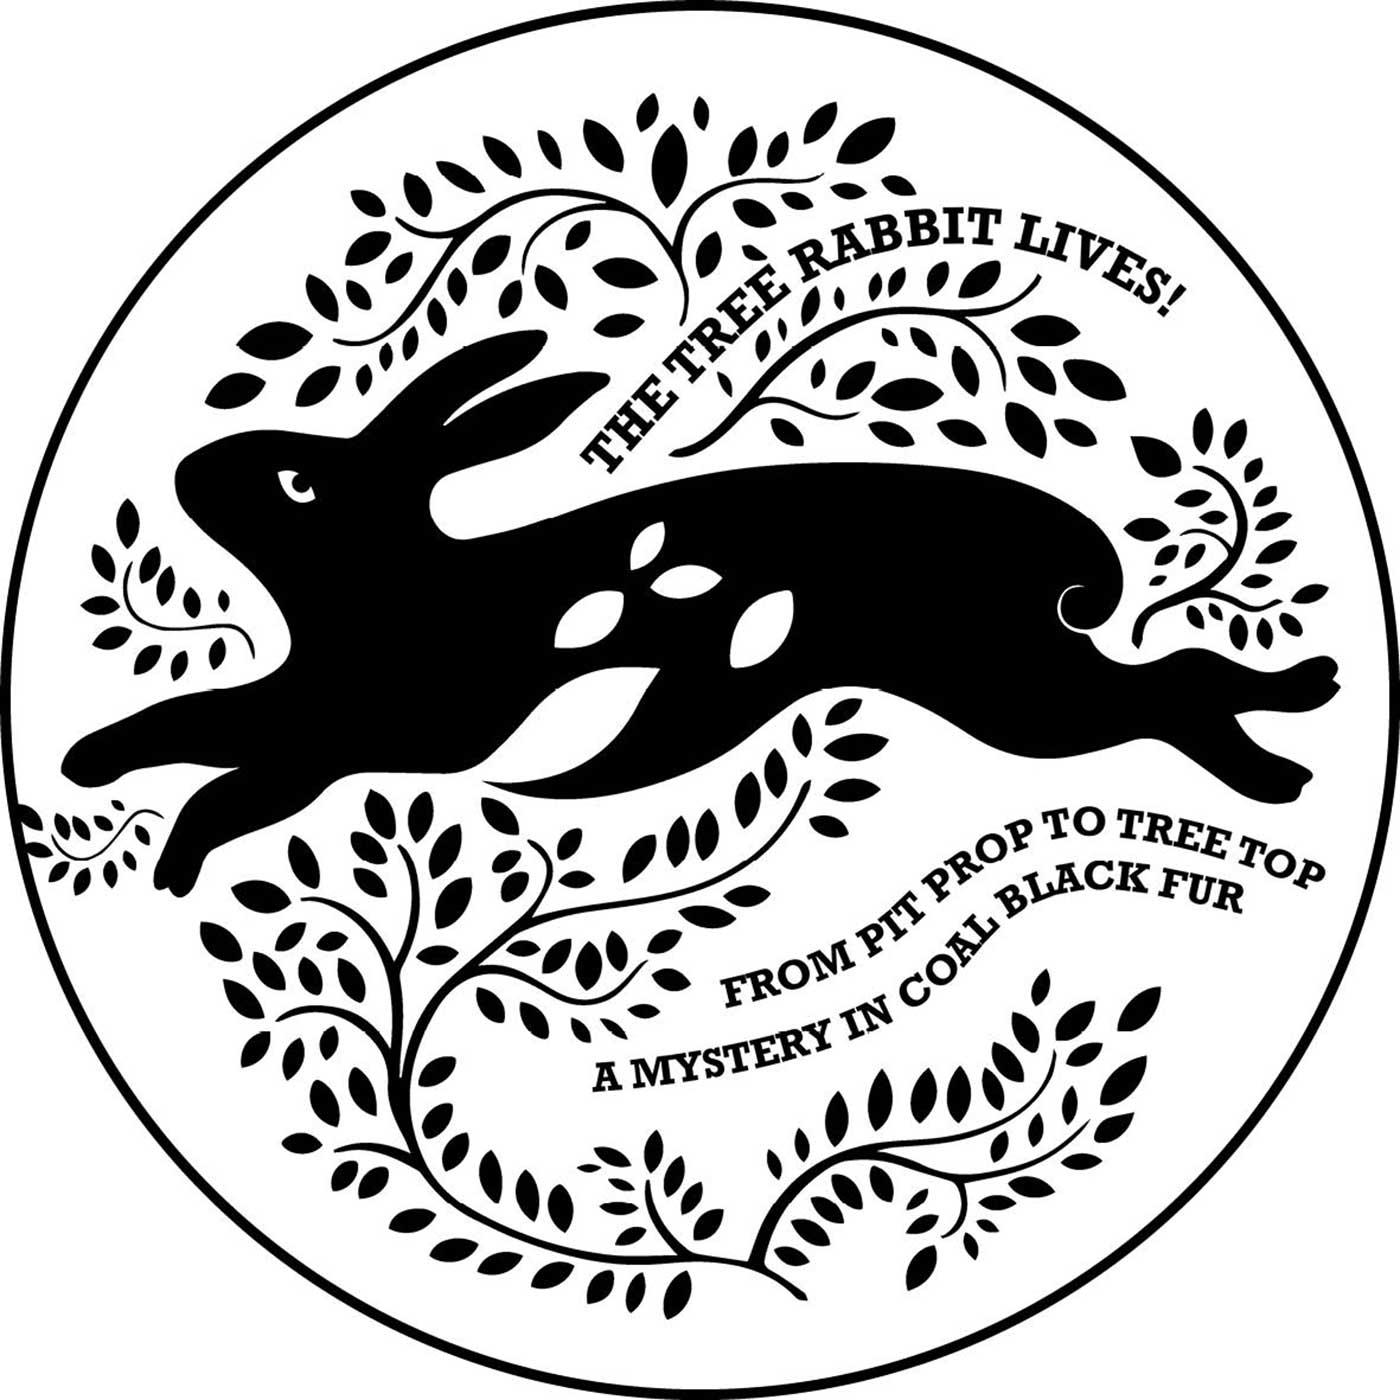 Coal bunny! Myth or magic?